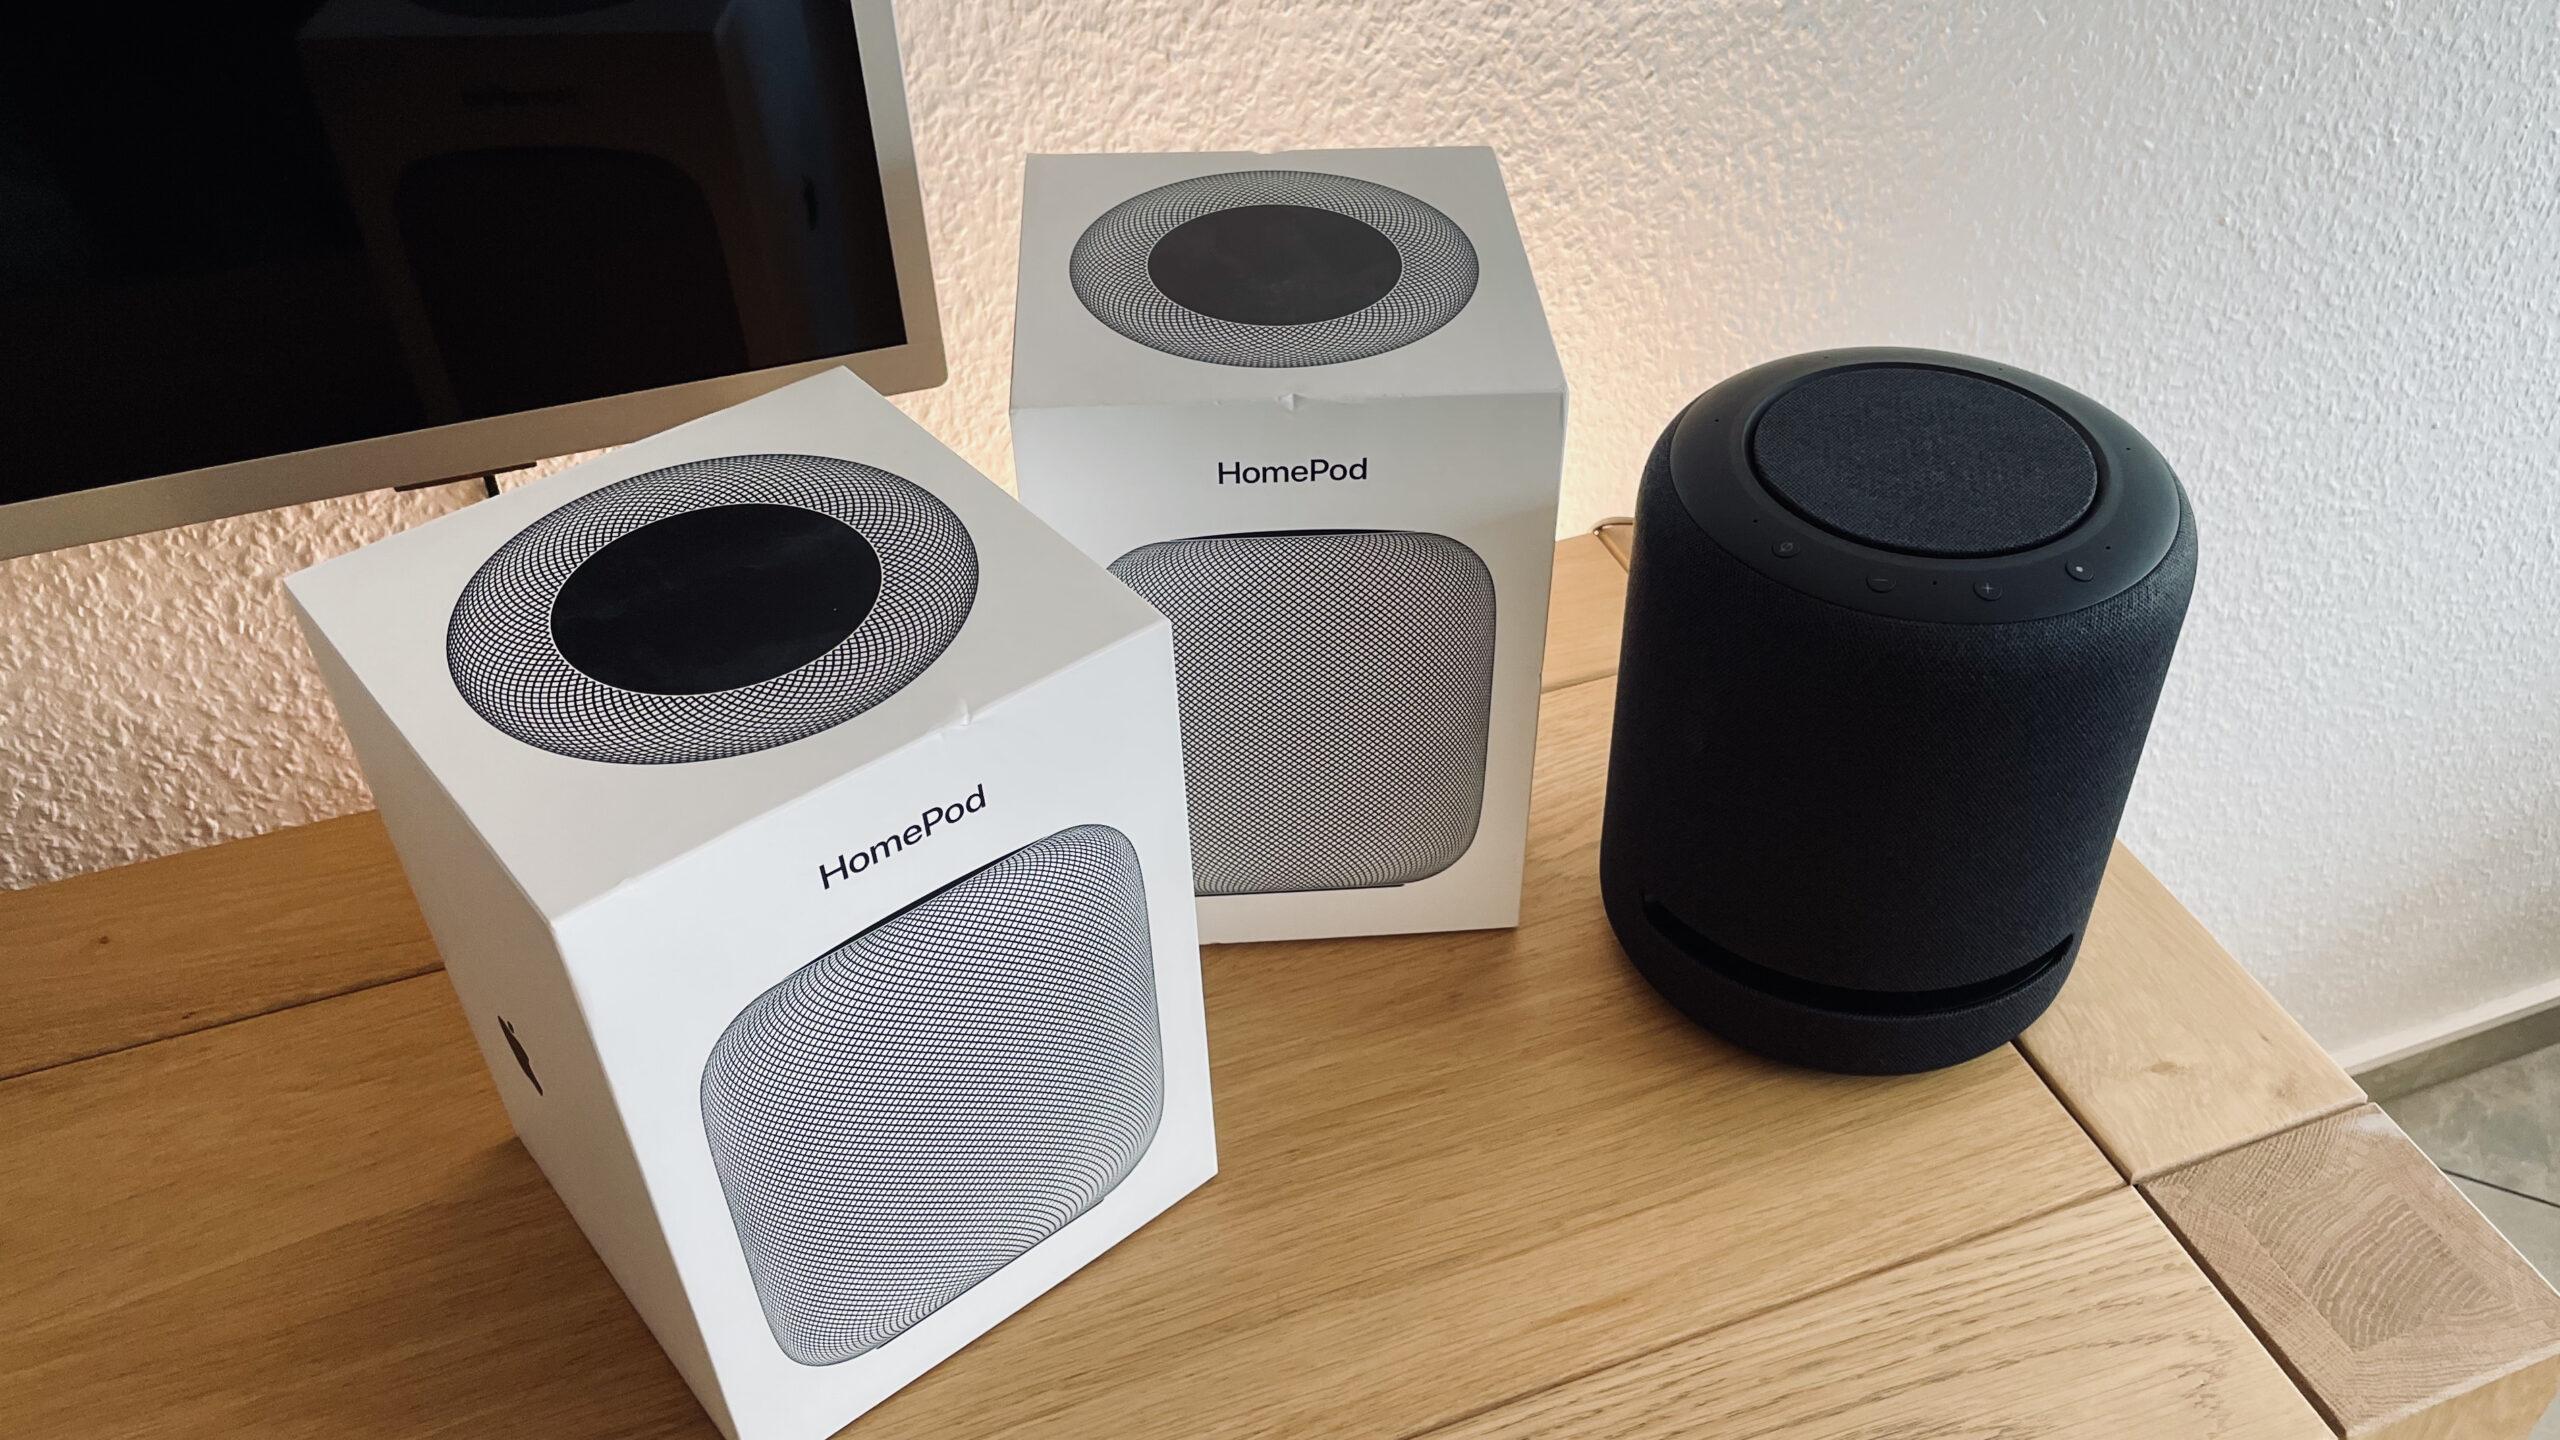 Siri Alexa Apple HomePod Echo Studio